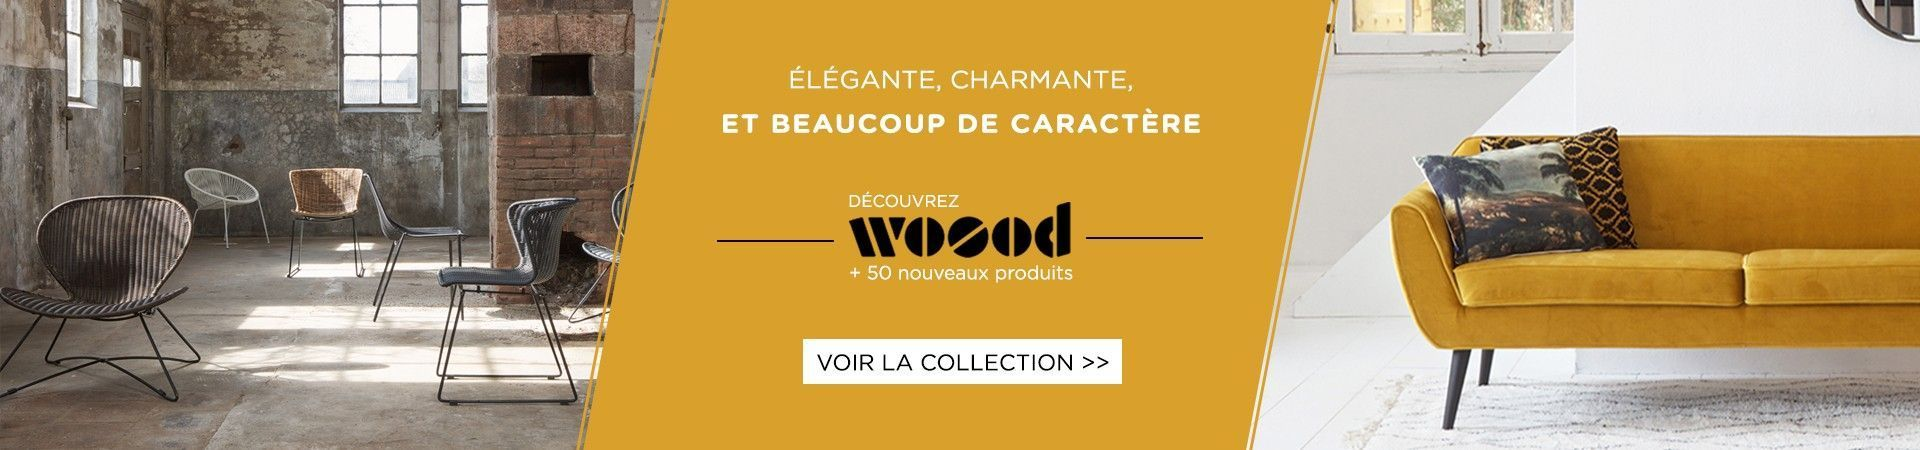 marque woood meubles design